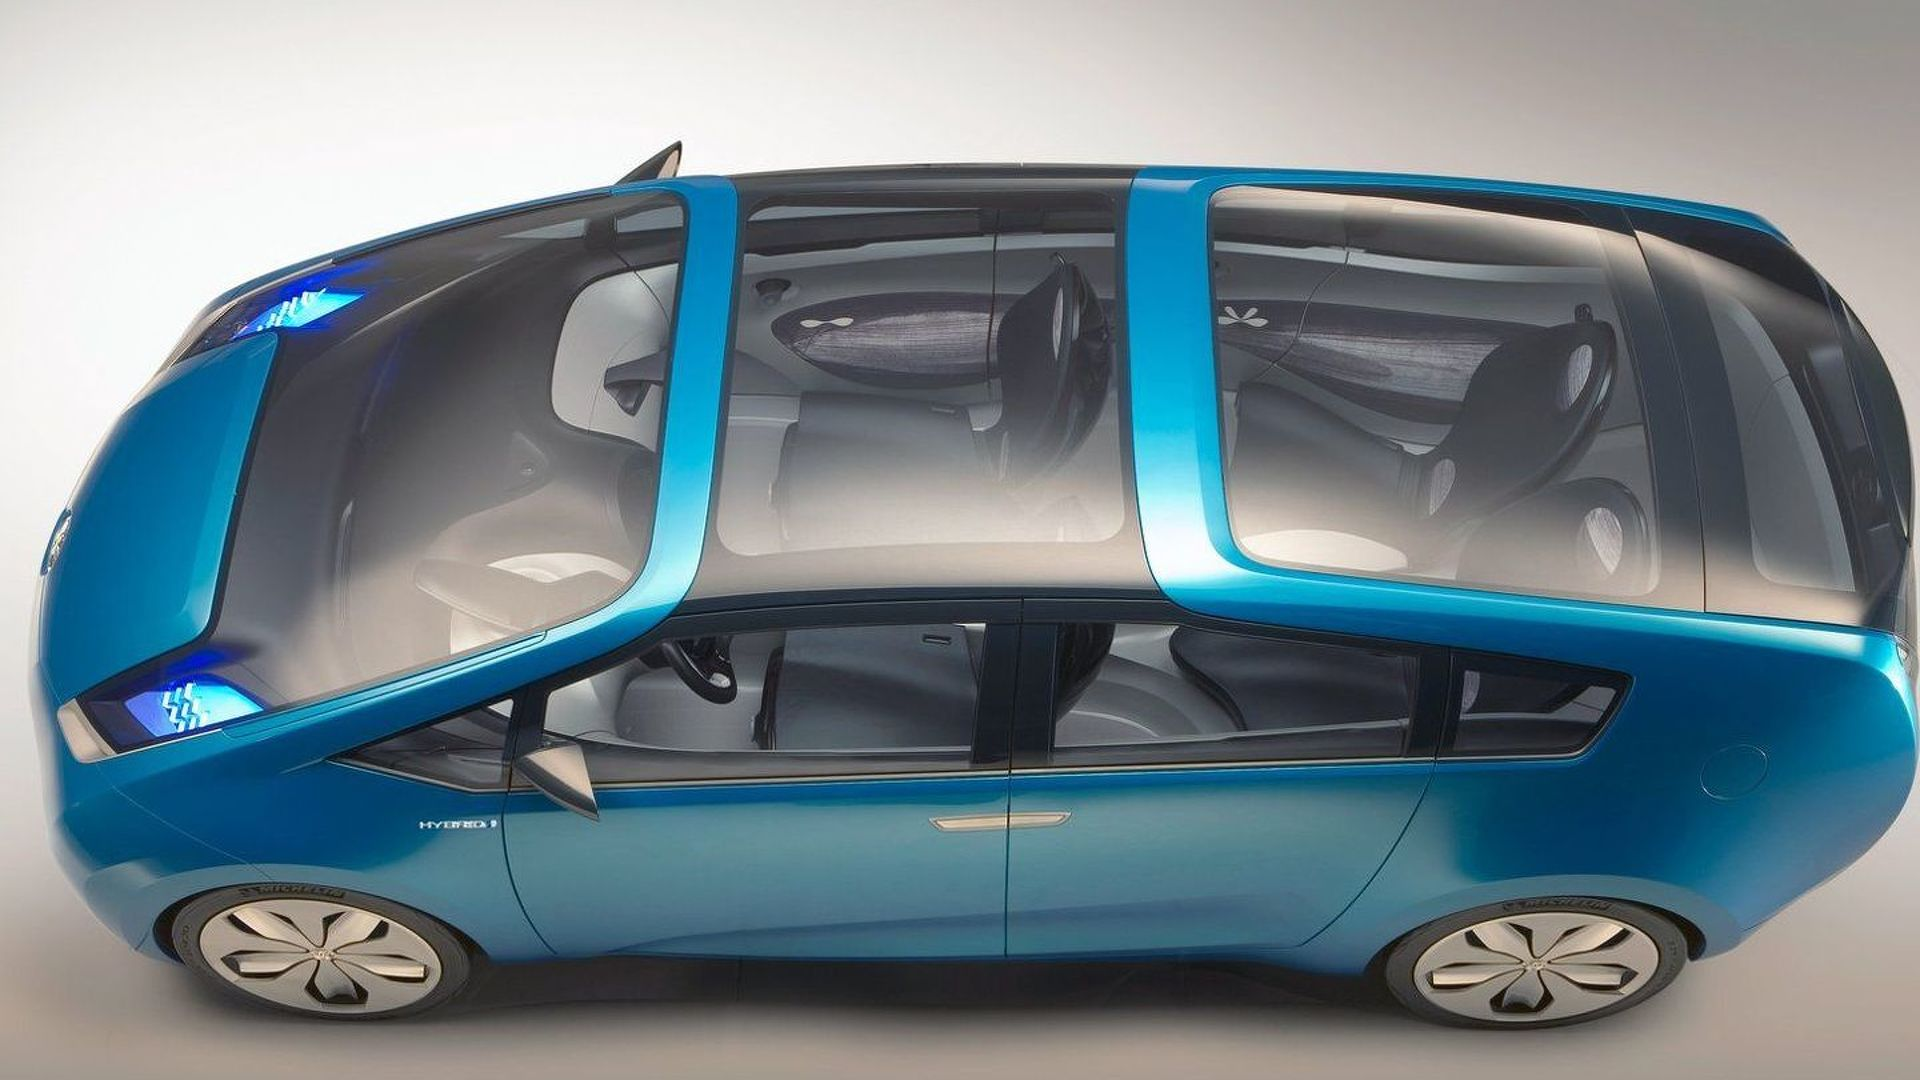 Toyota Prius minivan set for 2011 arrival - report